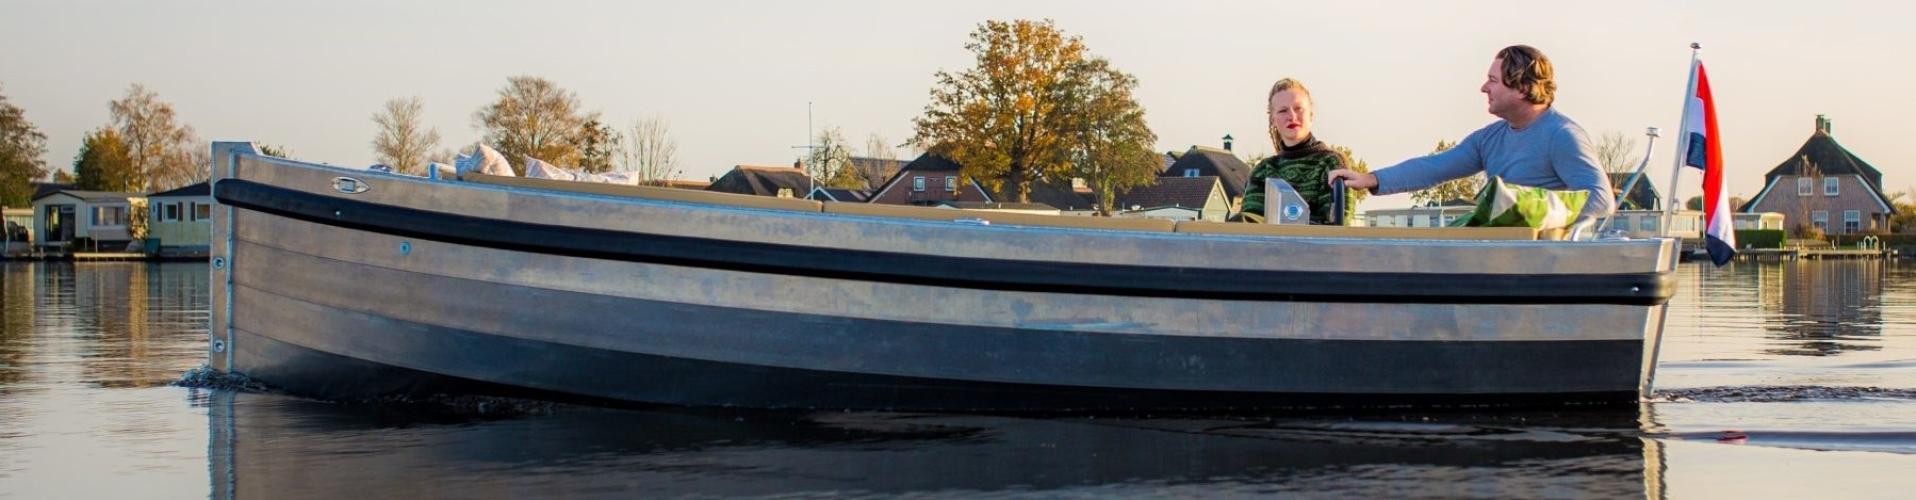 Eagle boats classic lijn aluminium sloepen